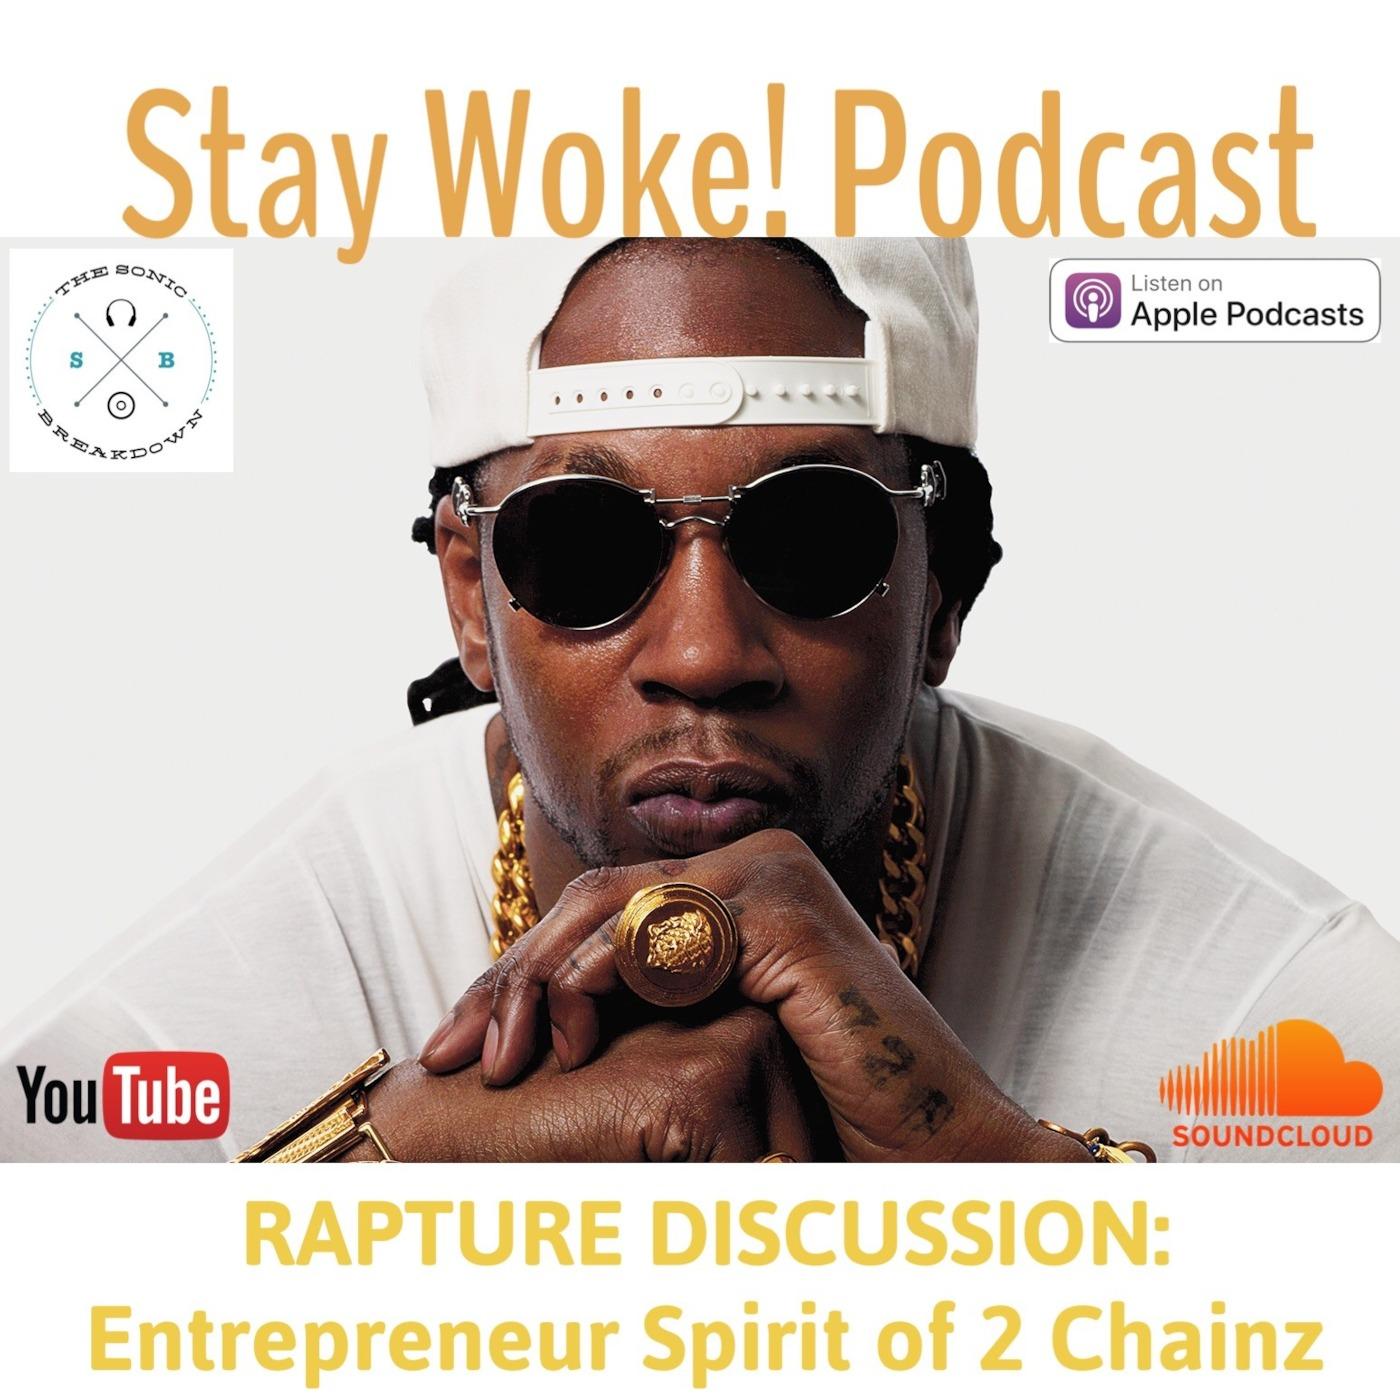 Podknife - Stay Woke! Podcast by DeRa Brinson